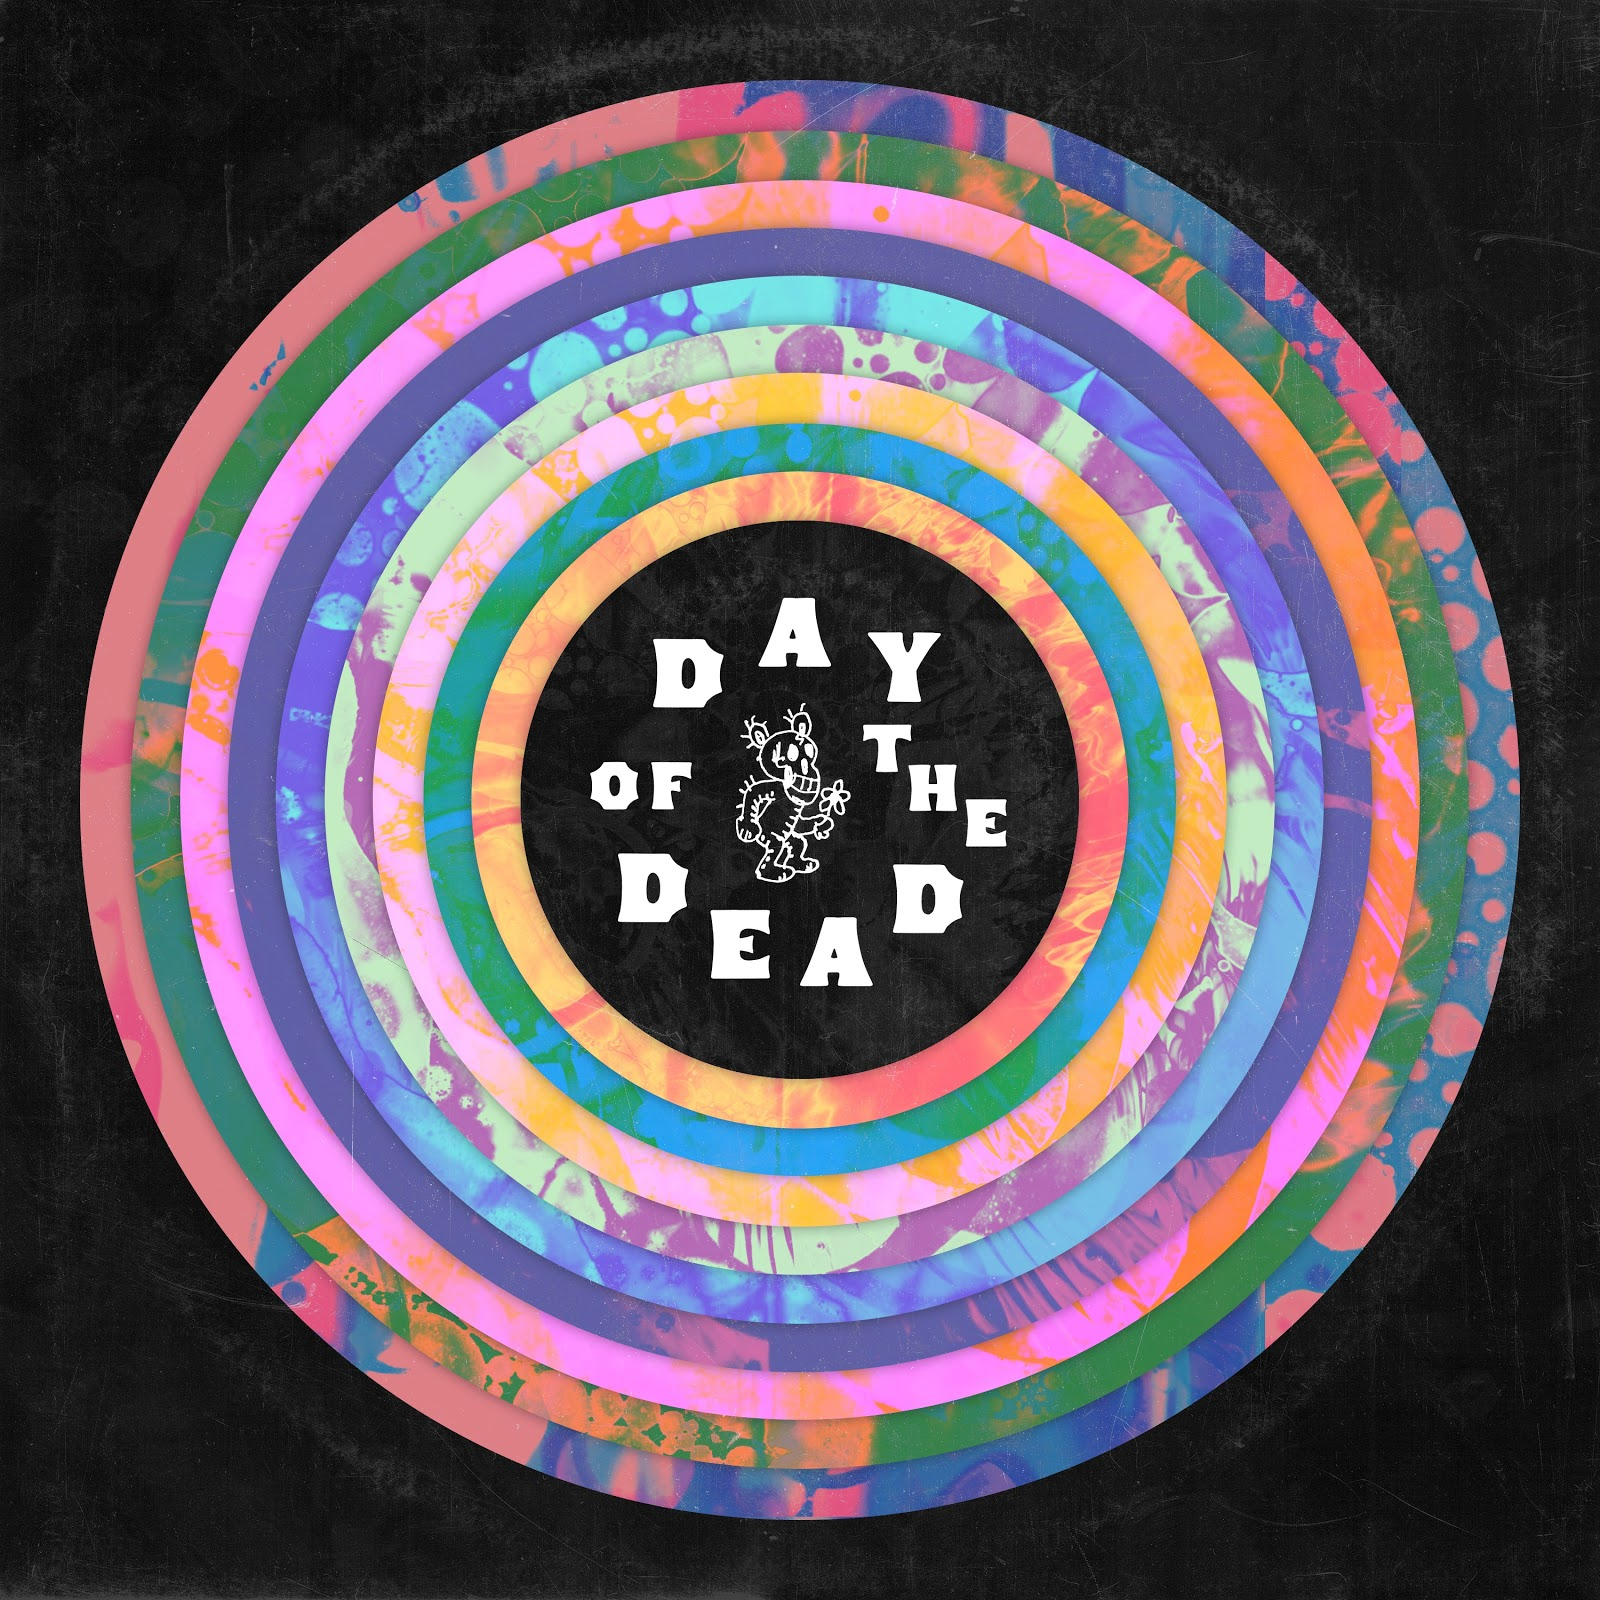 The National Unveil Massive Grateful Dead All-Star Tribute Album